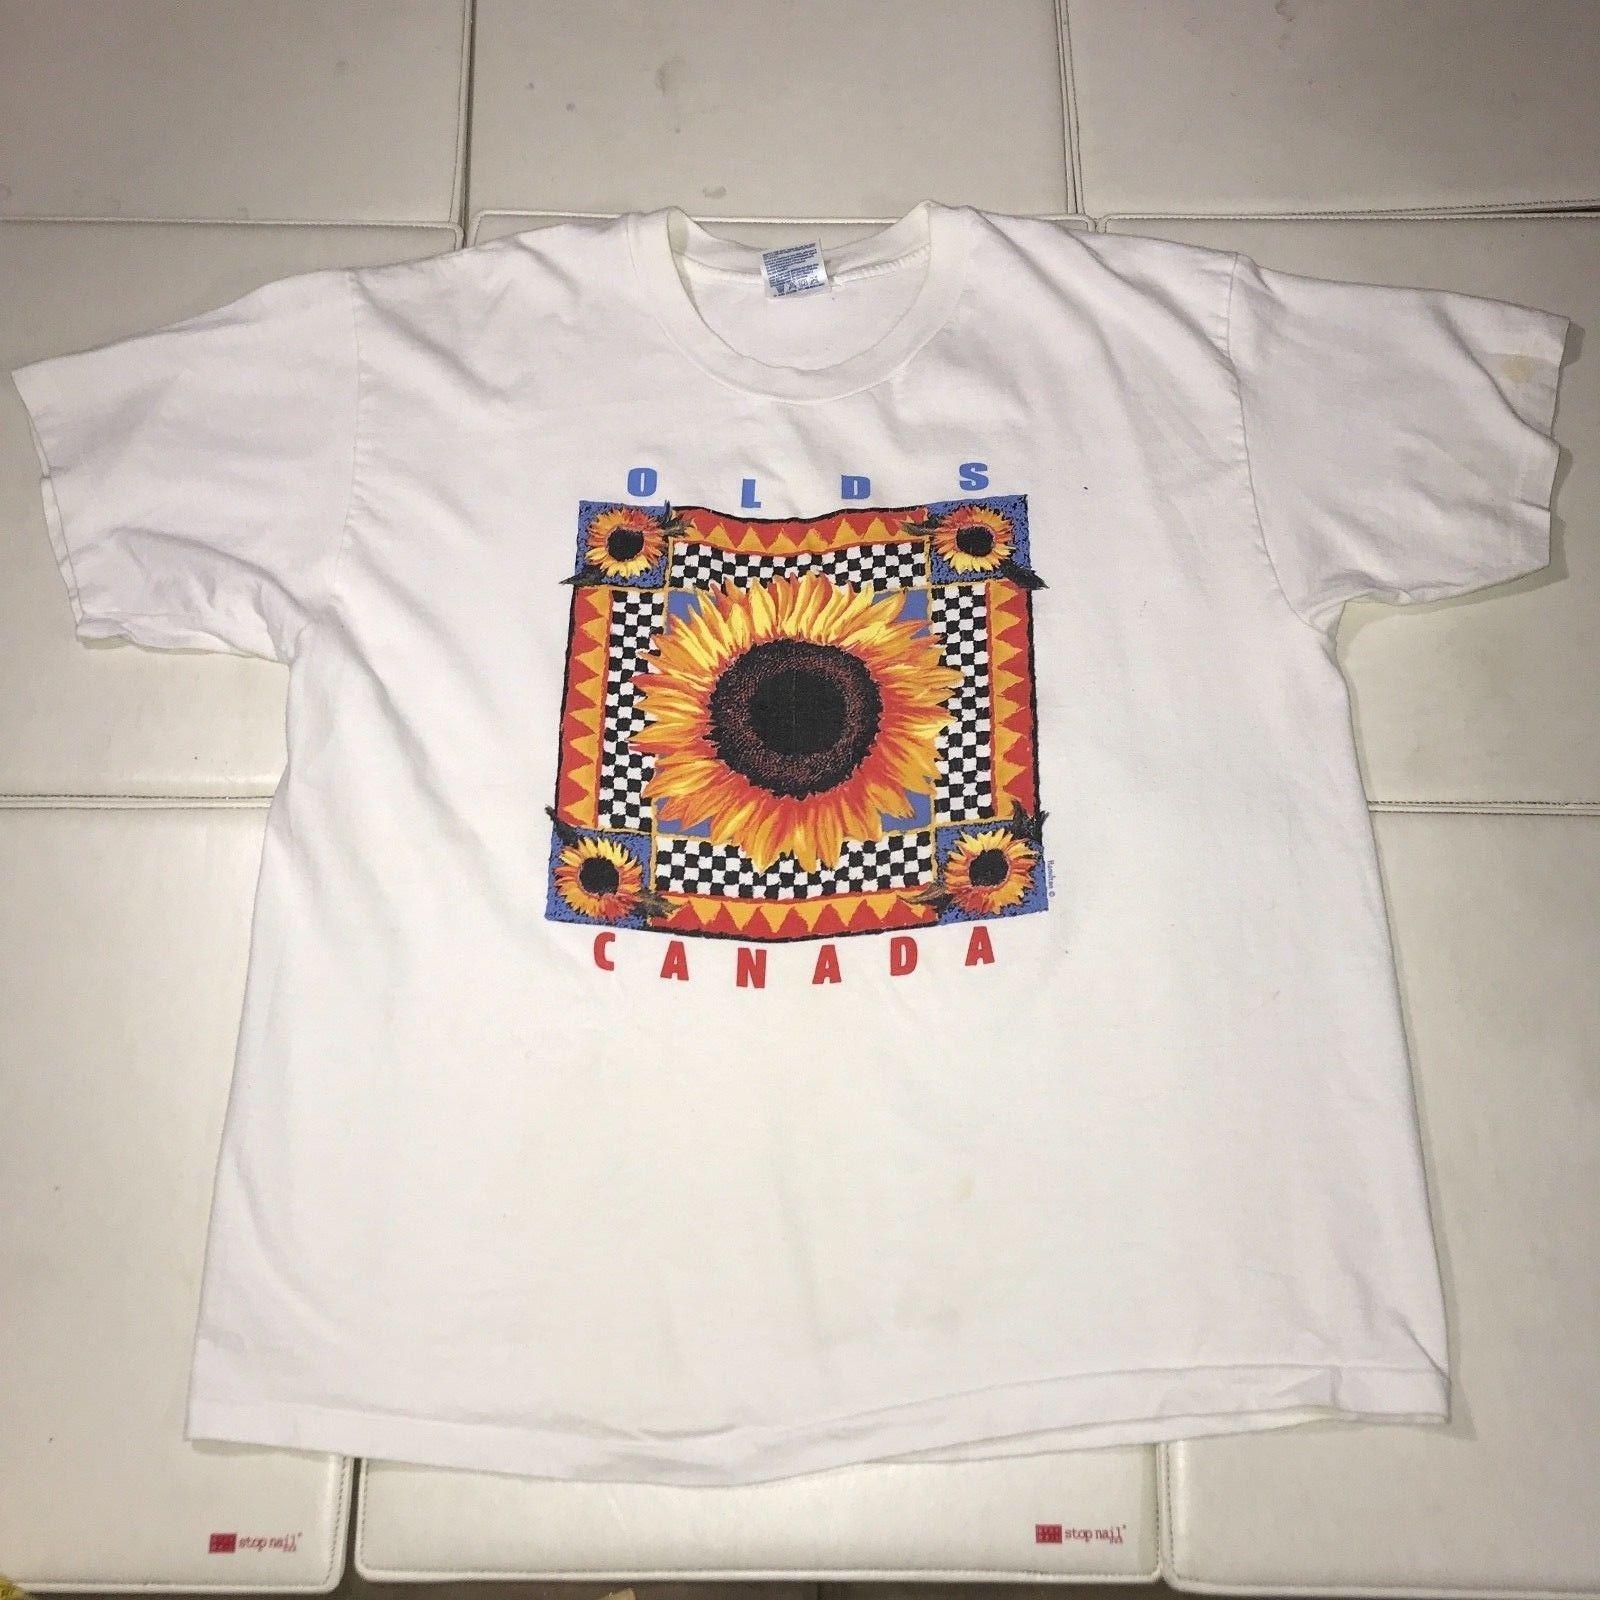 3496aed57f8f Sun Flower Vintage Tourist XL T Shirt Hamilton Olds Canada Wholesale 100%  Cotton Short Sleeve Top Tee Basic High Quality Shirt Designer Customised T  Shirts ...